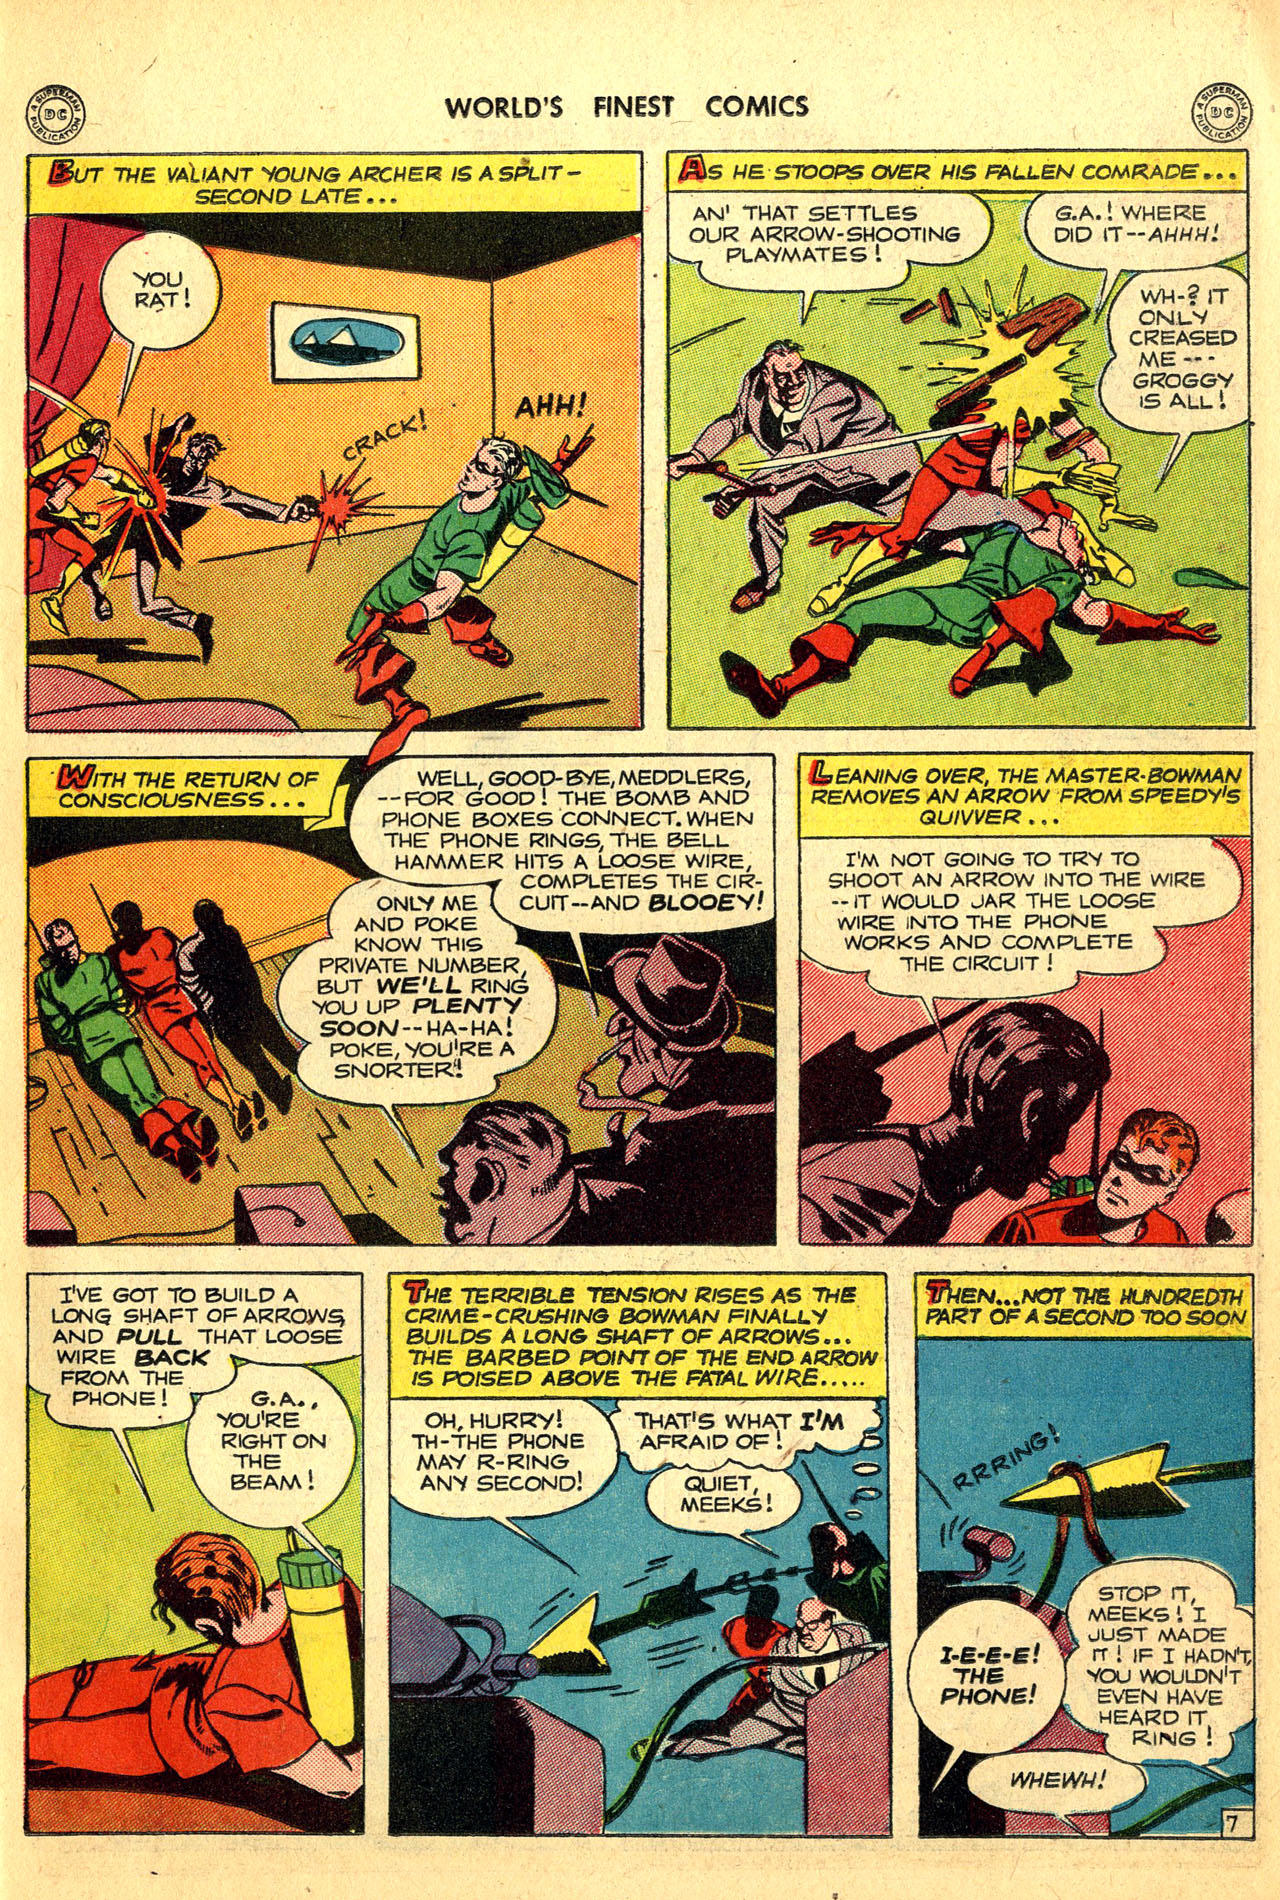 Read online World's Finest Comics comic -  Issue #18 - 55